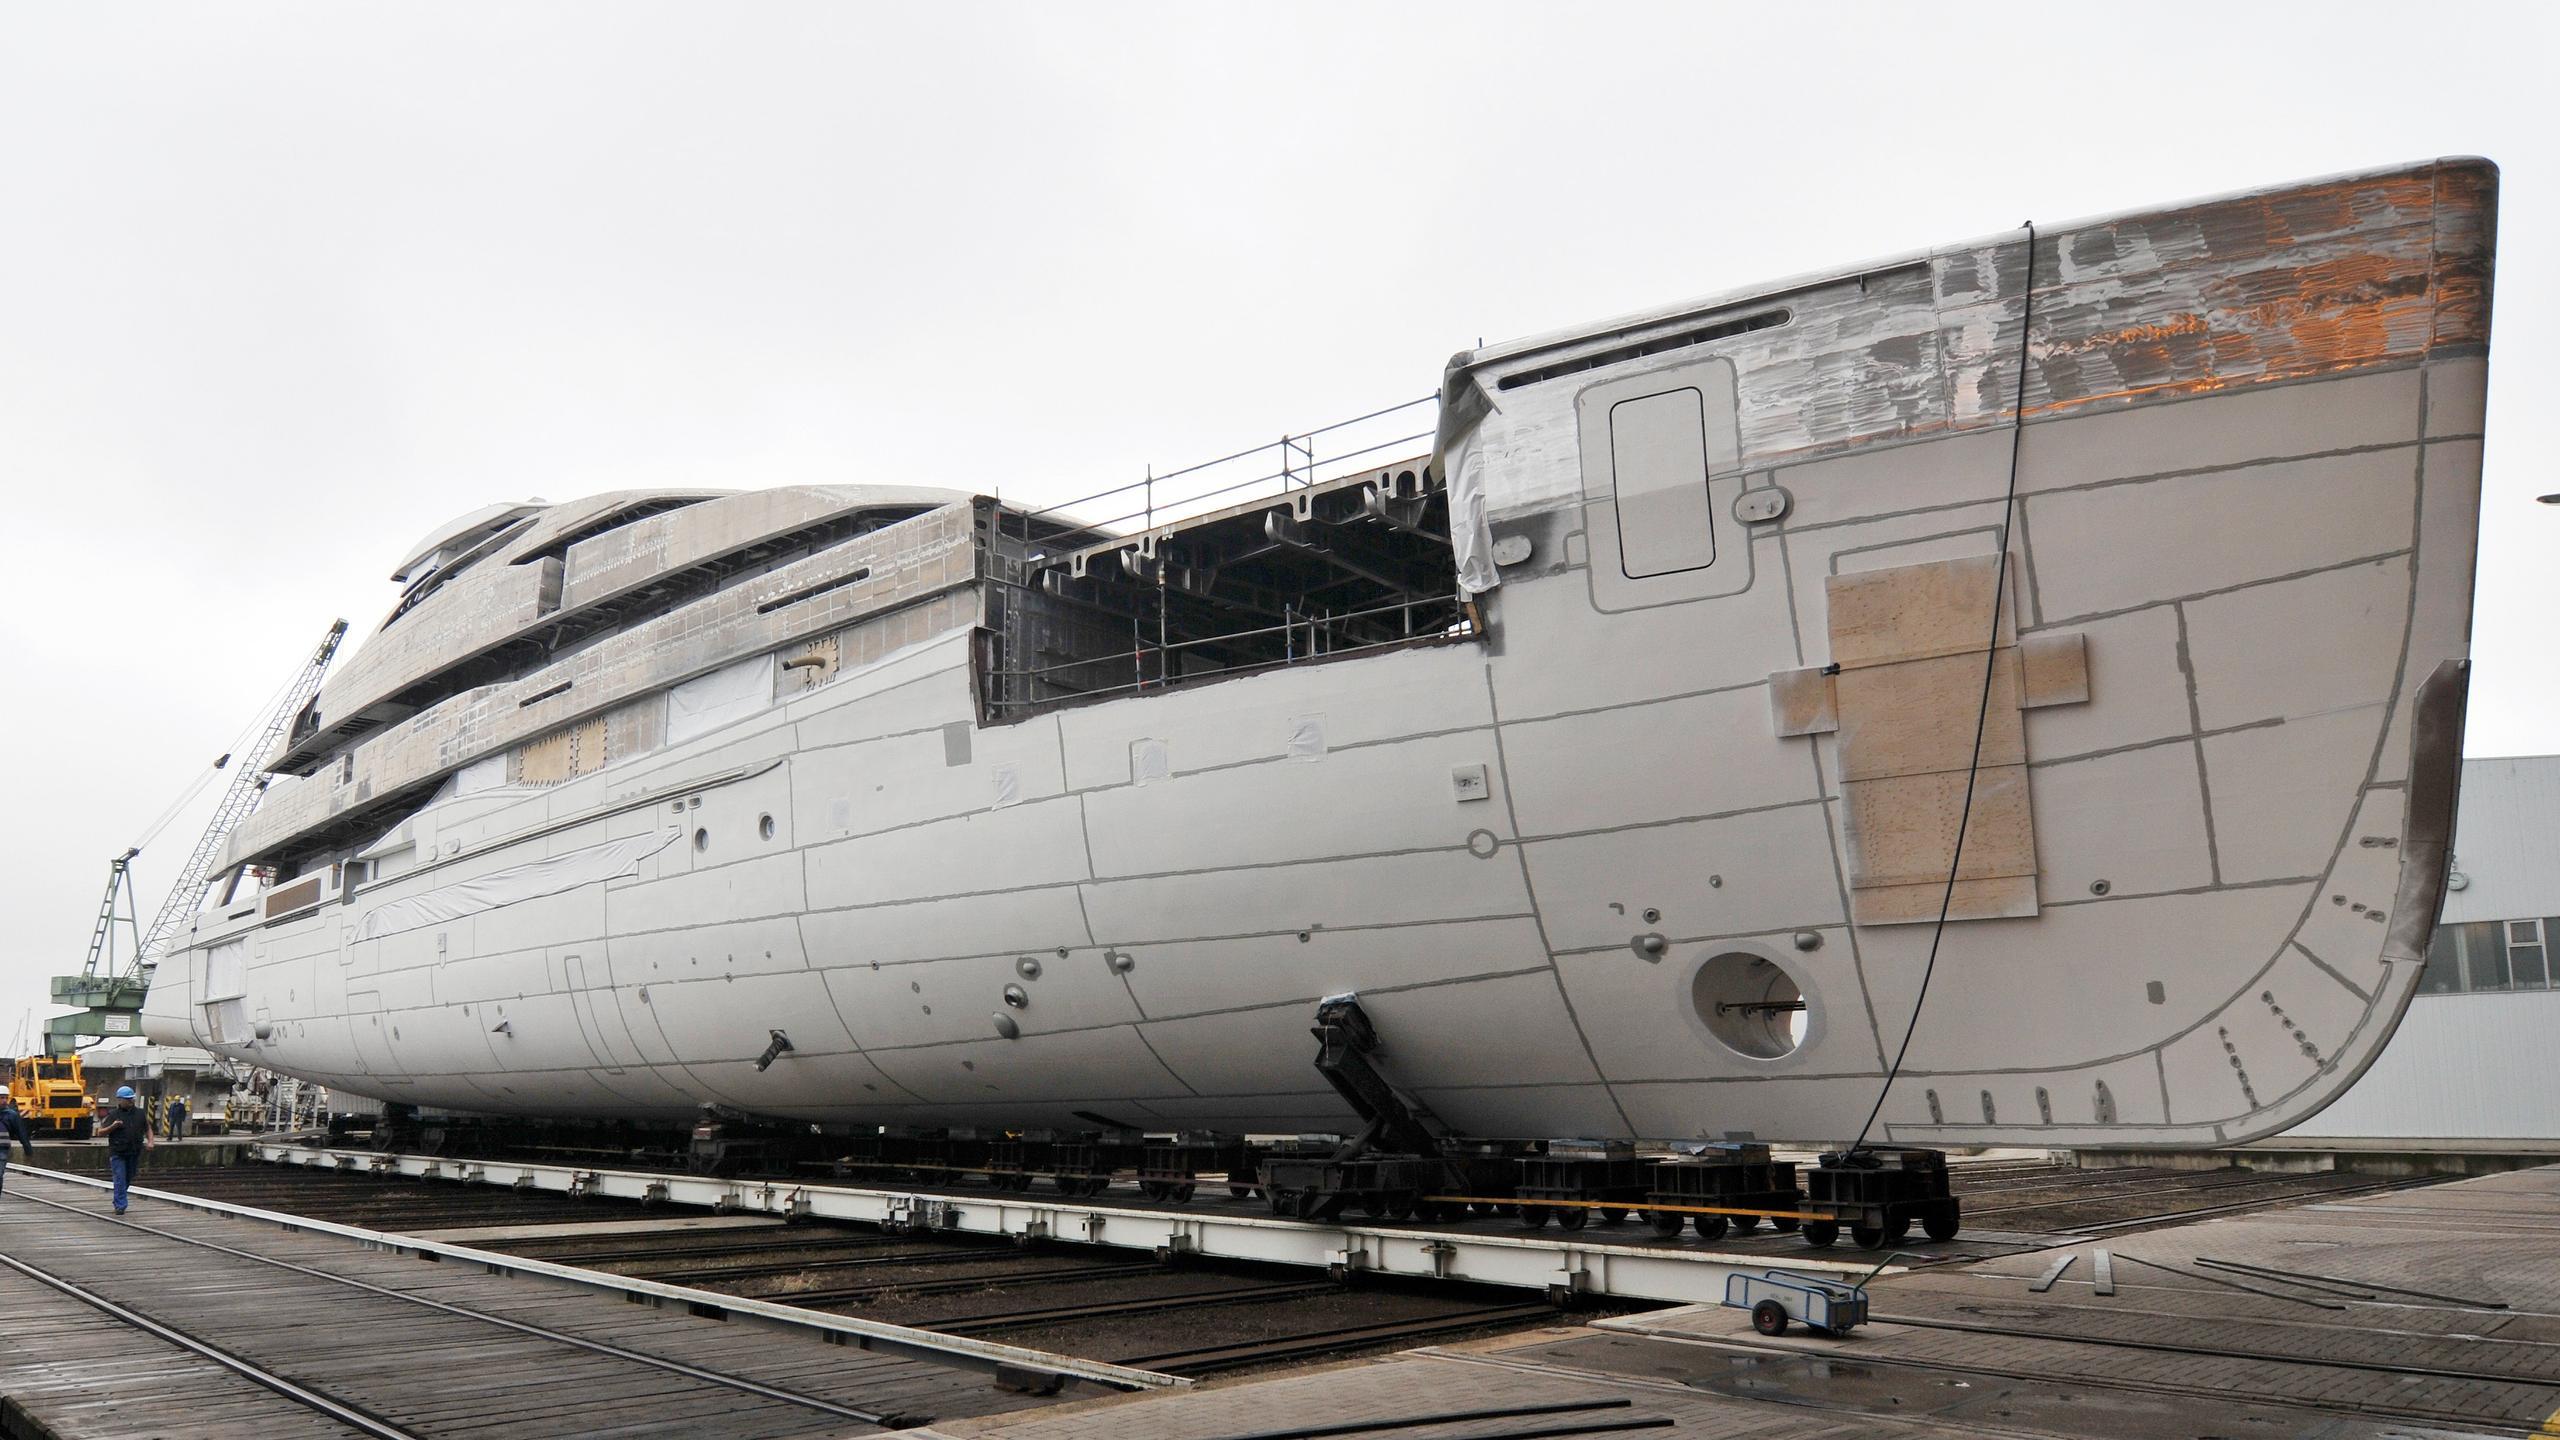 elandess hull 6502 motoryacht abeking rasmussen 74m 2018 under construction half profile